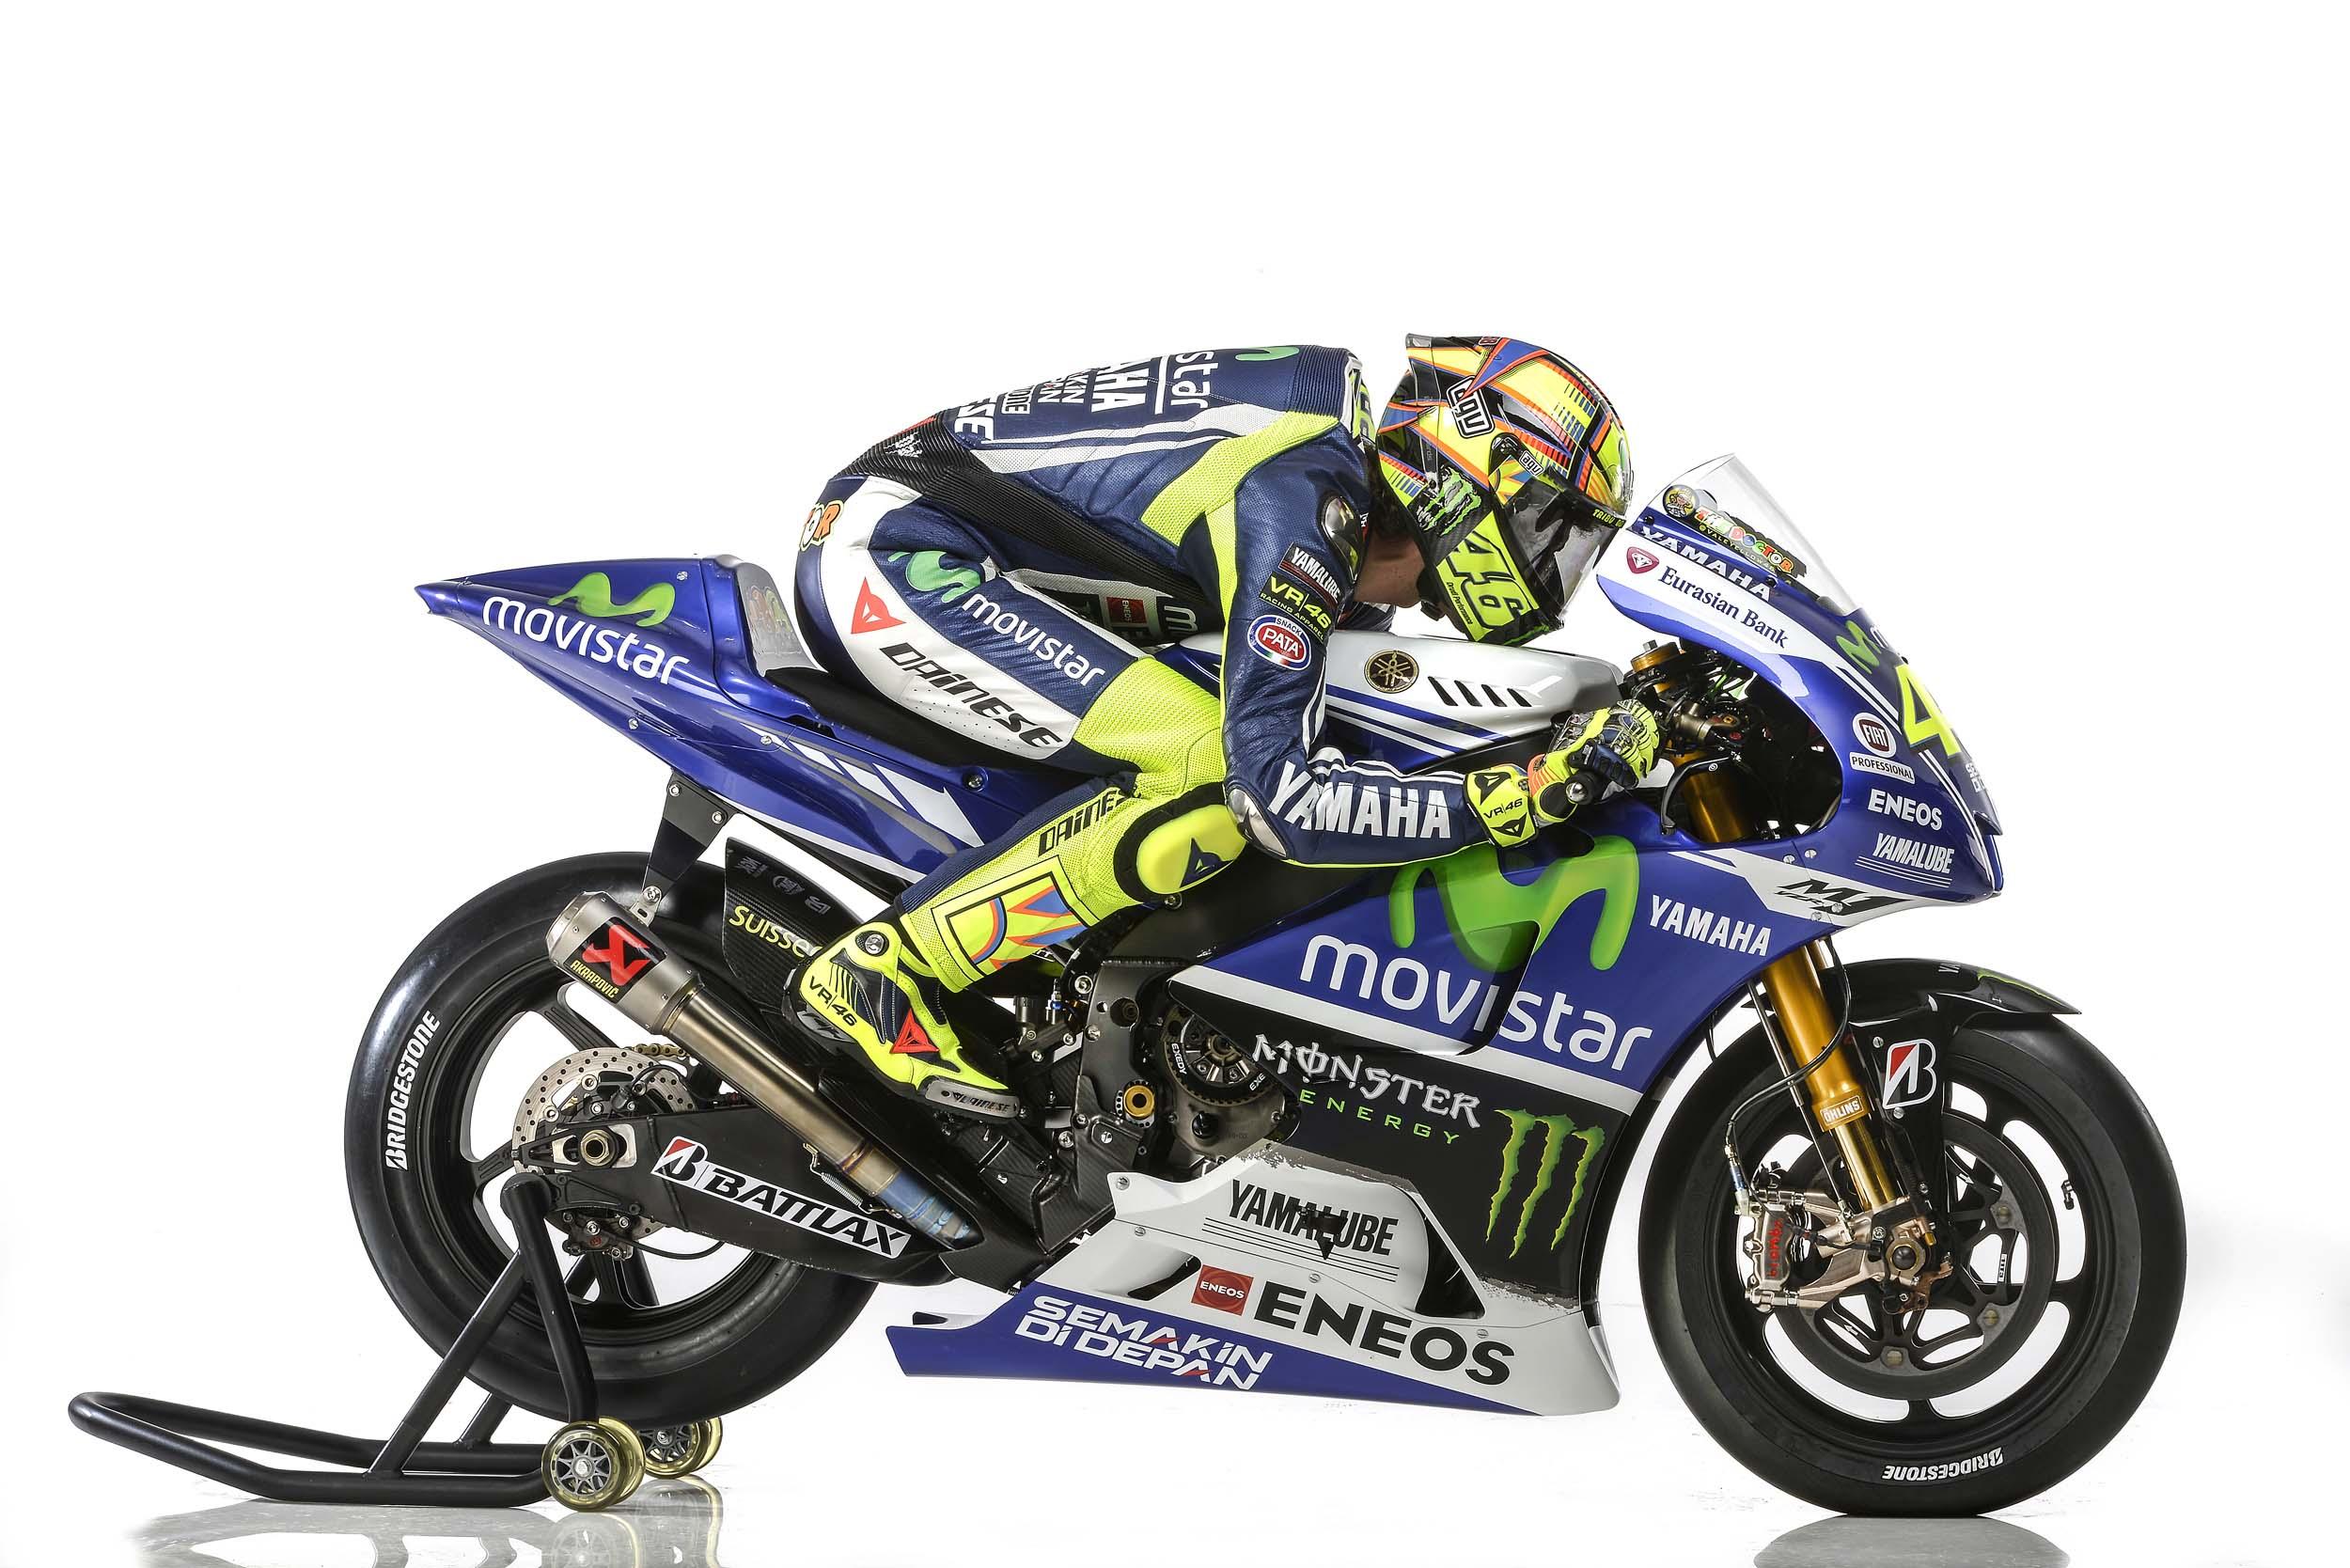 Movistar Yamaha 2014 MotoGP Livery Revealed - Asphalt & Rubber